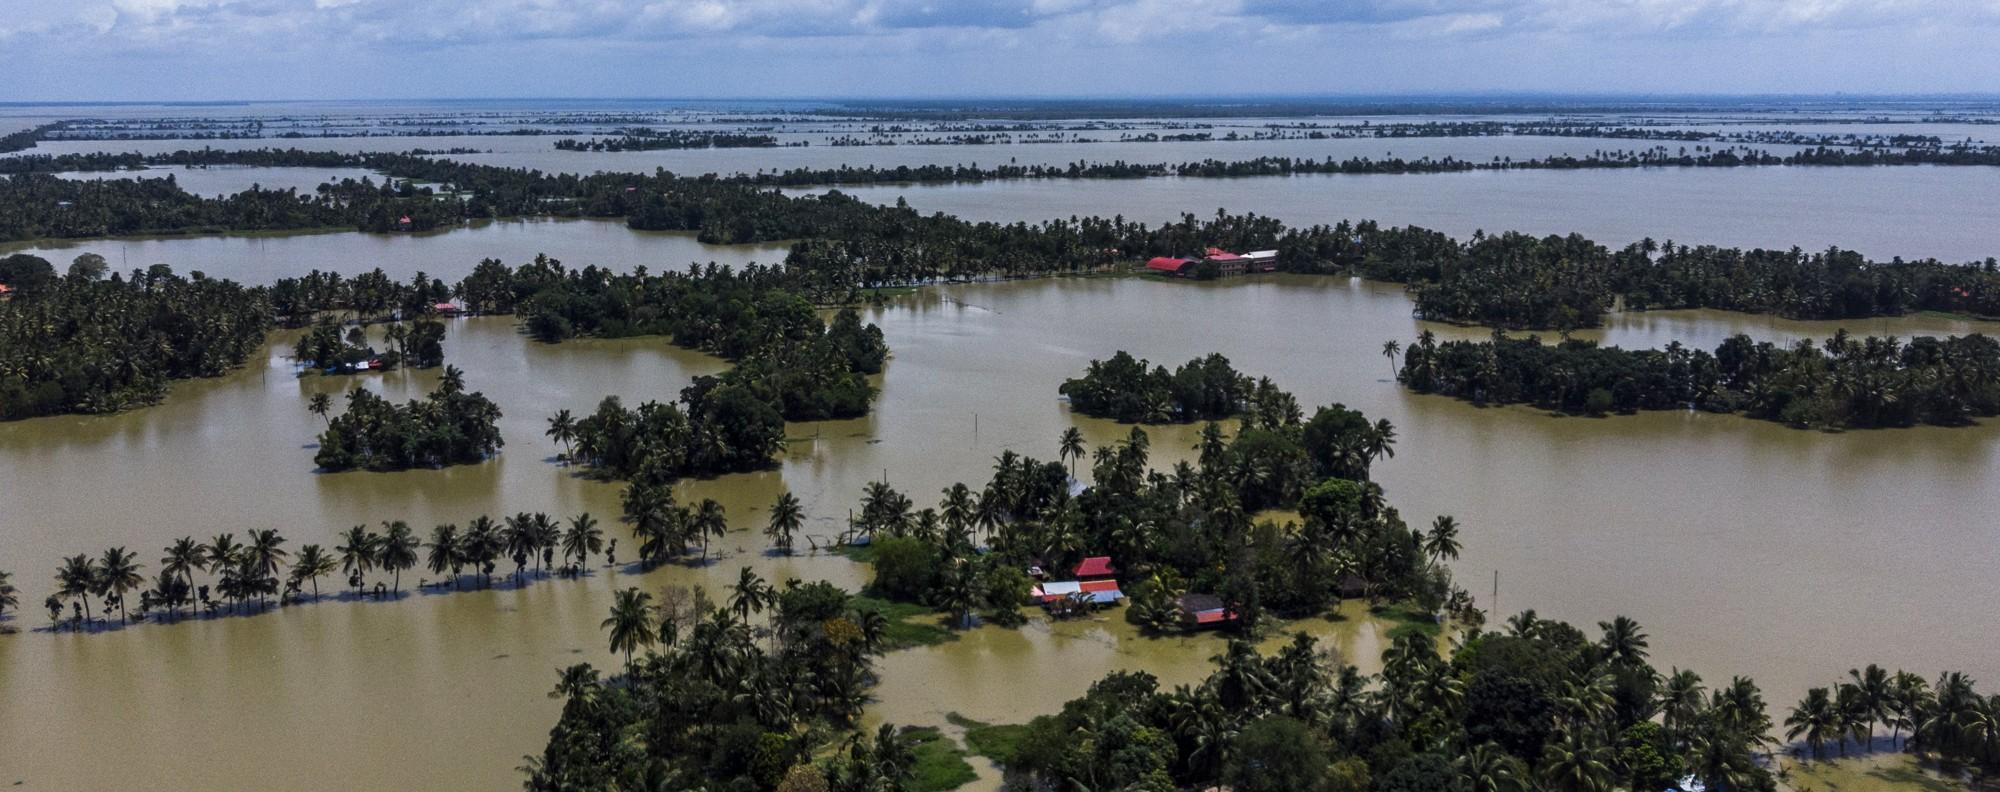 kerala india floods 2018